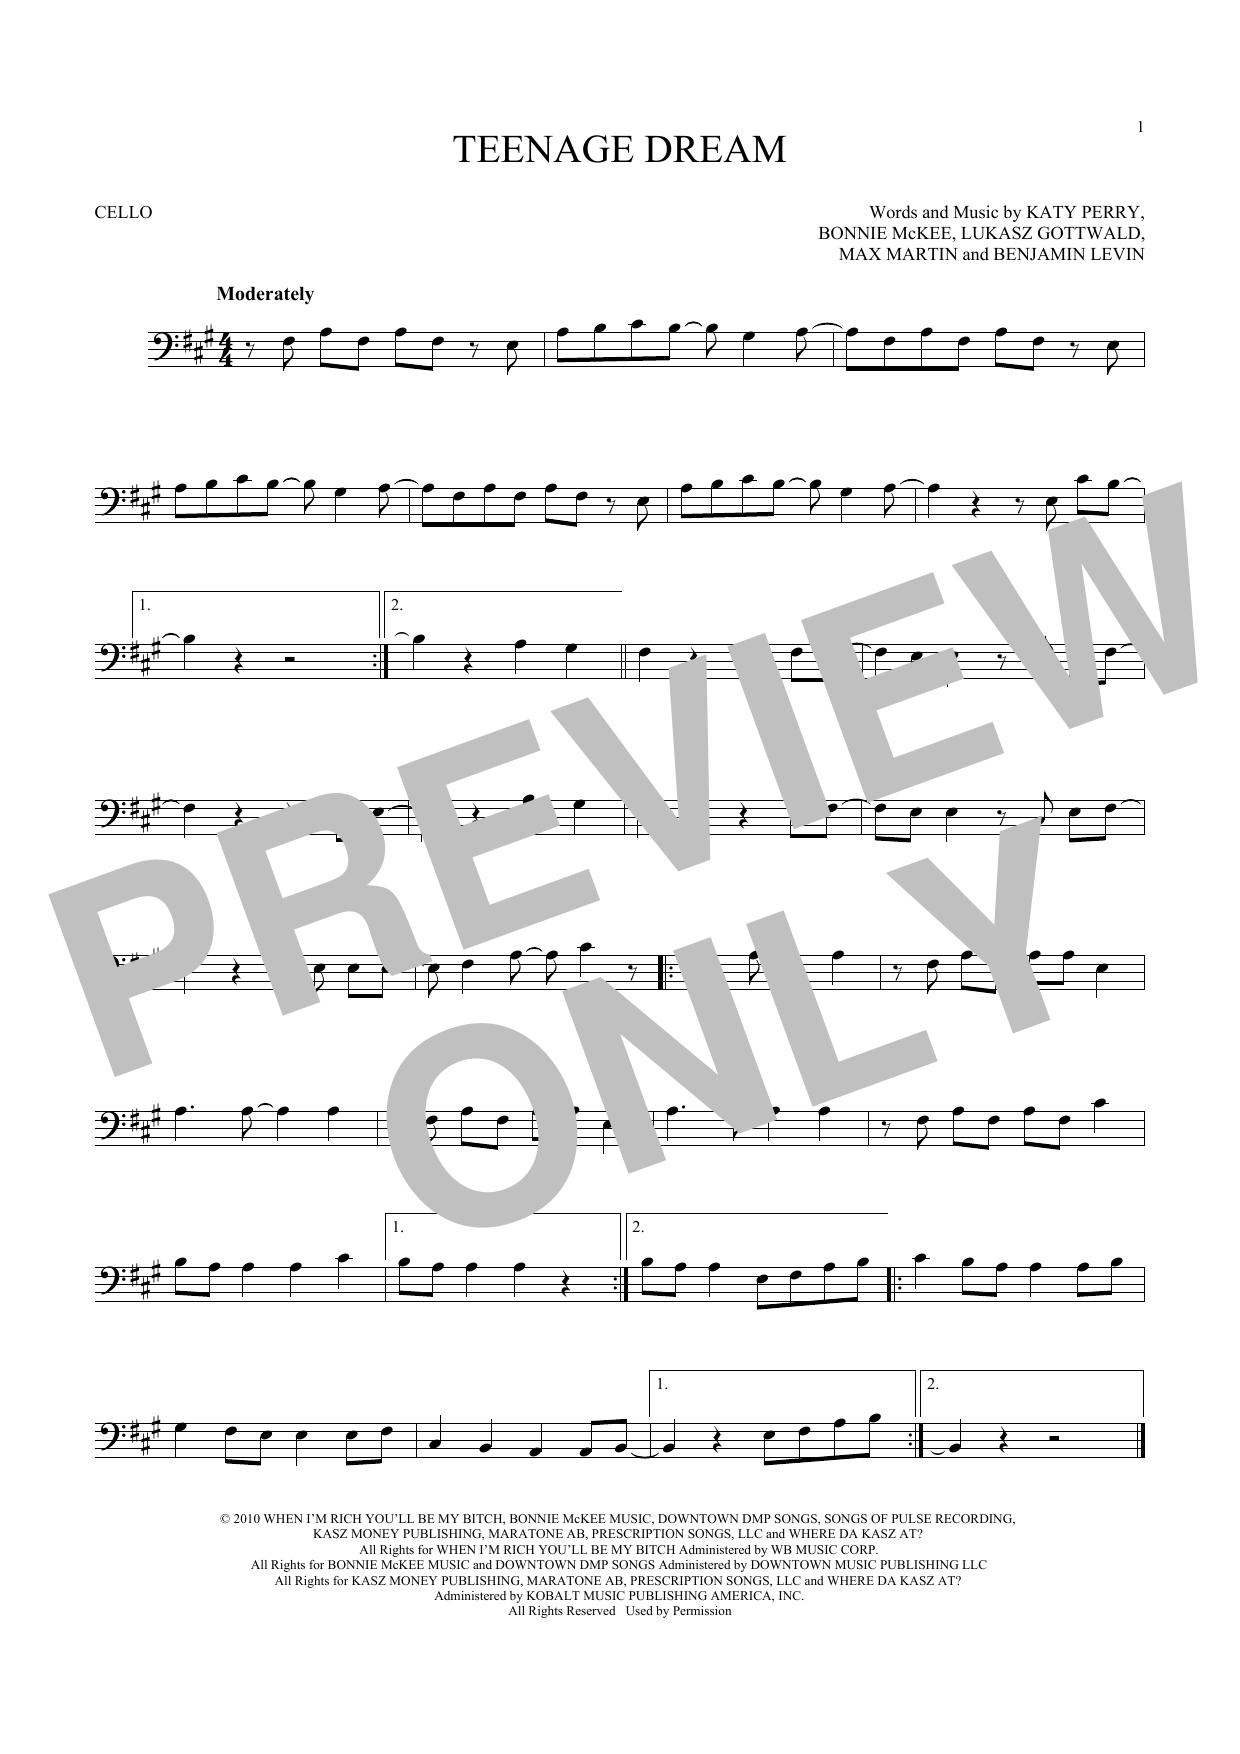 Sheet Music Digital Files To Print Licensed Katy Perry Digital